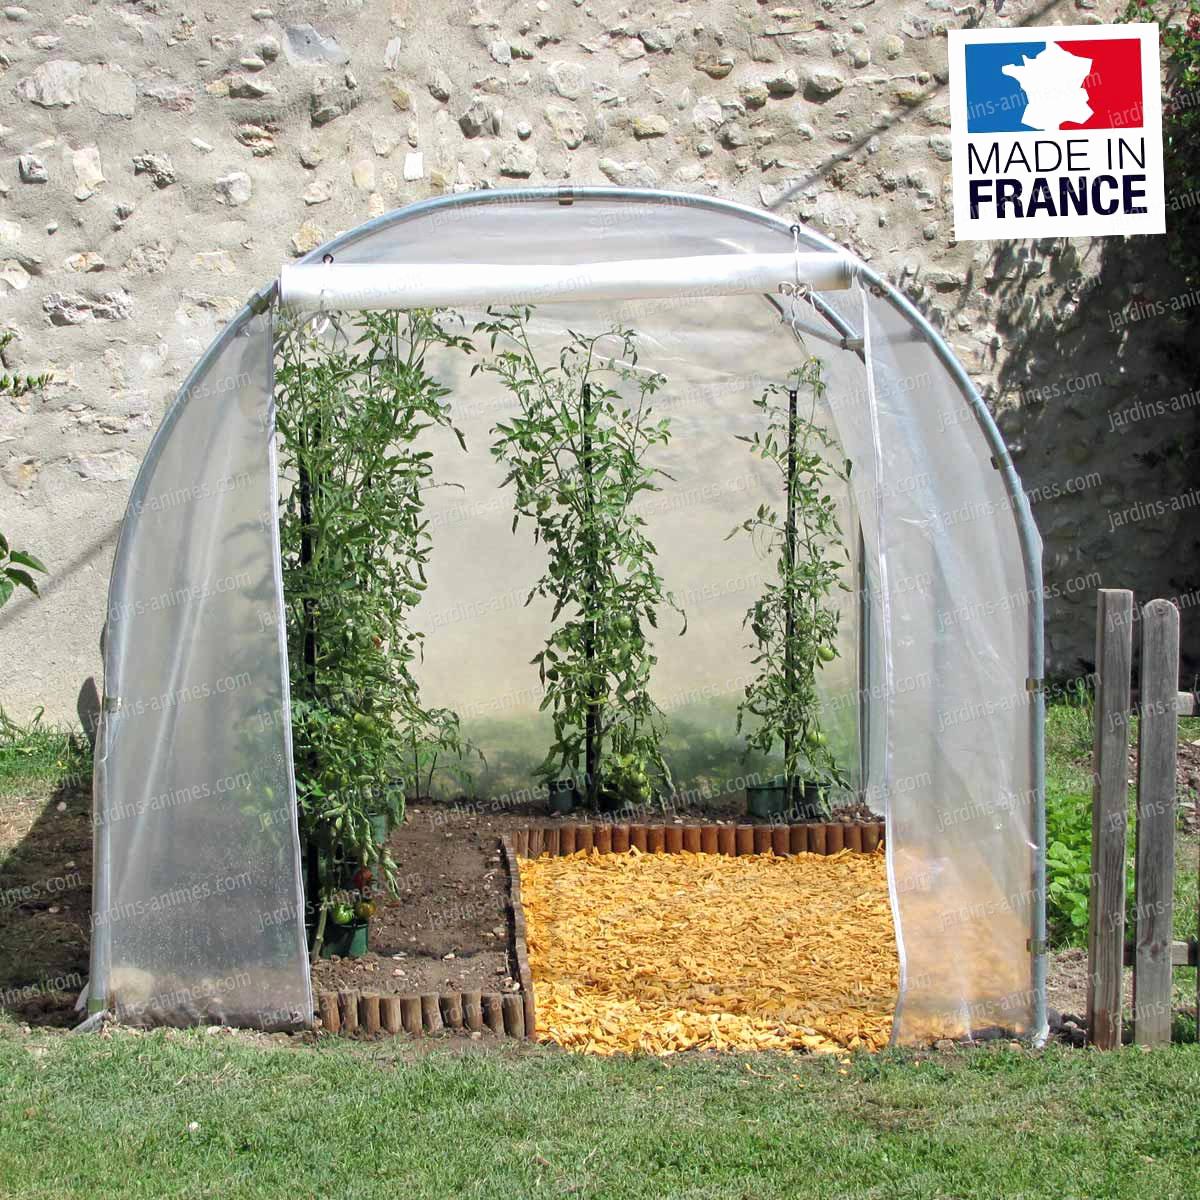 Les Serres De Gouaix Luxe Galerie Serre De Jardin Richel élégant Awesome Serre De Jardin Design S